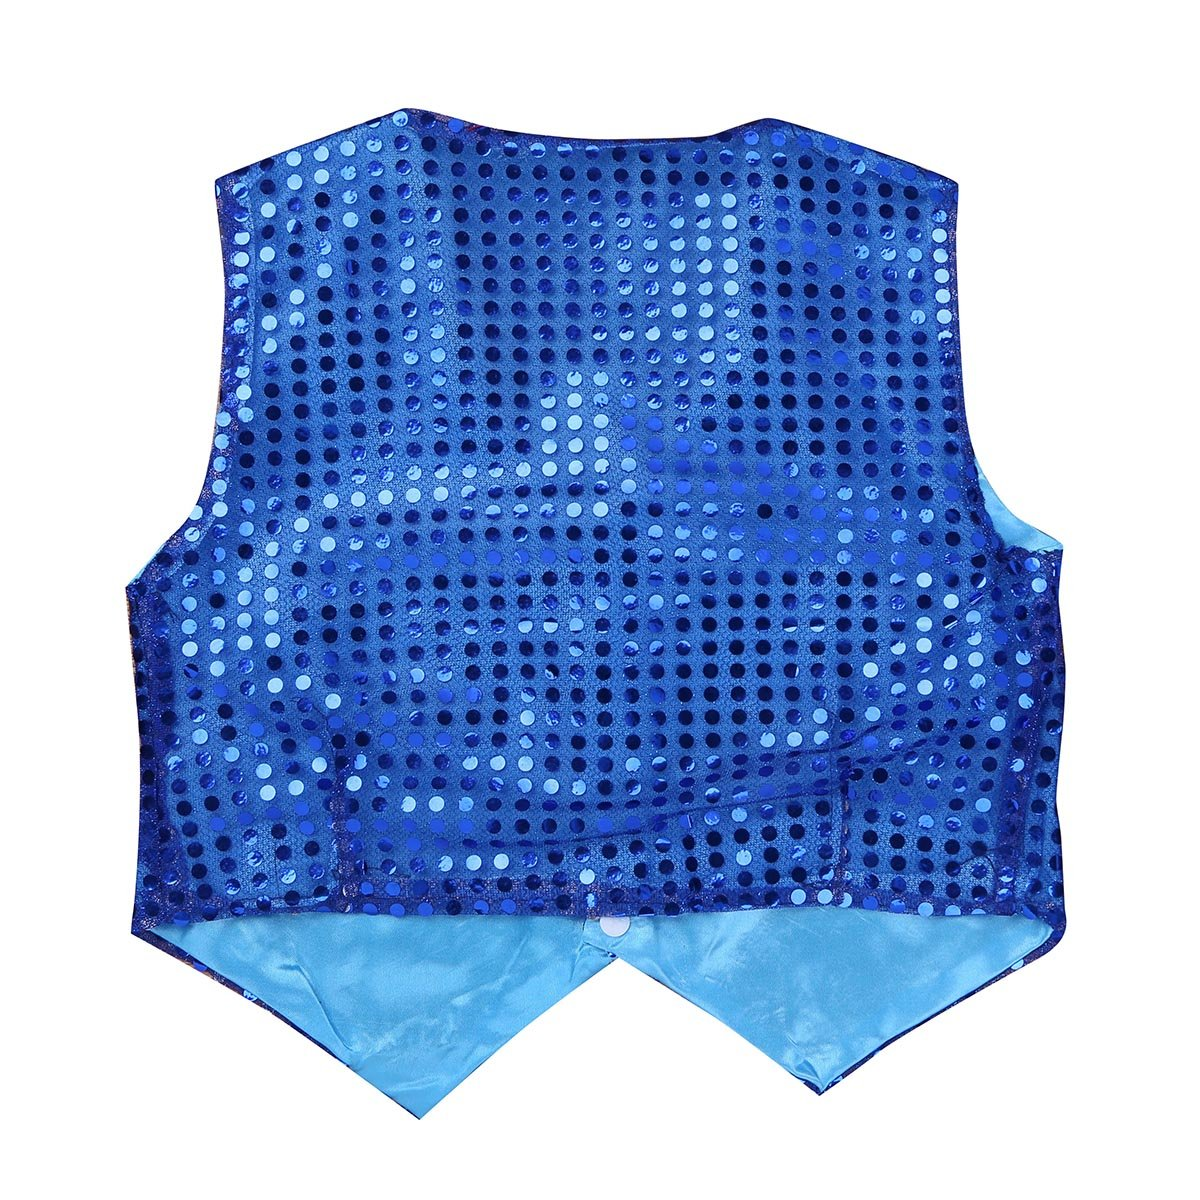 iEFiEL Boys Girls Sequined Vest Top Waistcoat Costume Kids Choir Jazz Dance Stage Performance Fancy Jacket